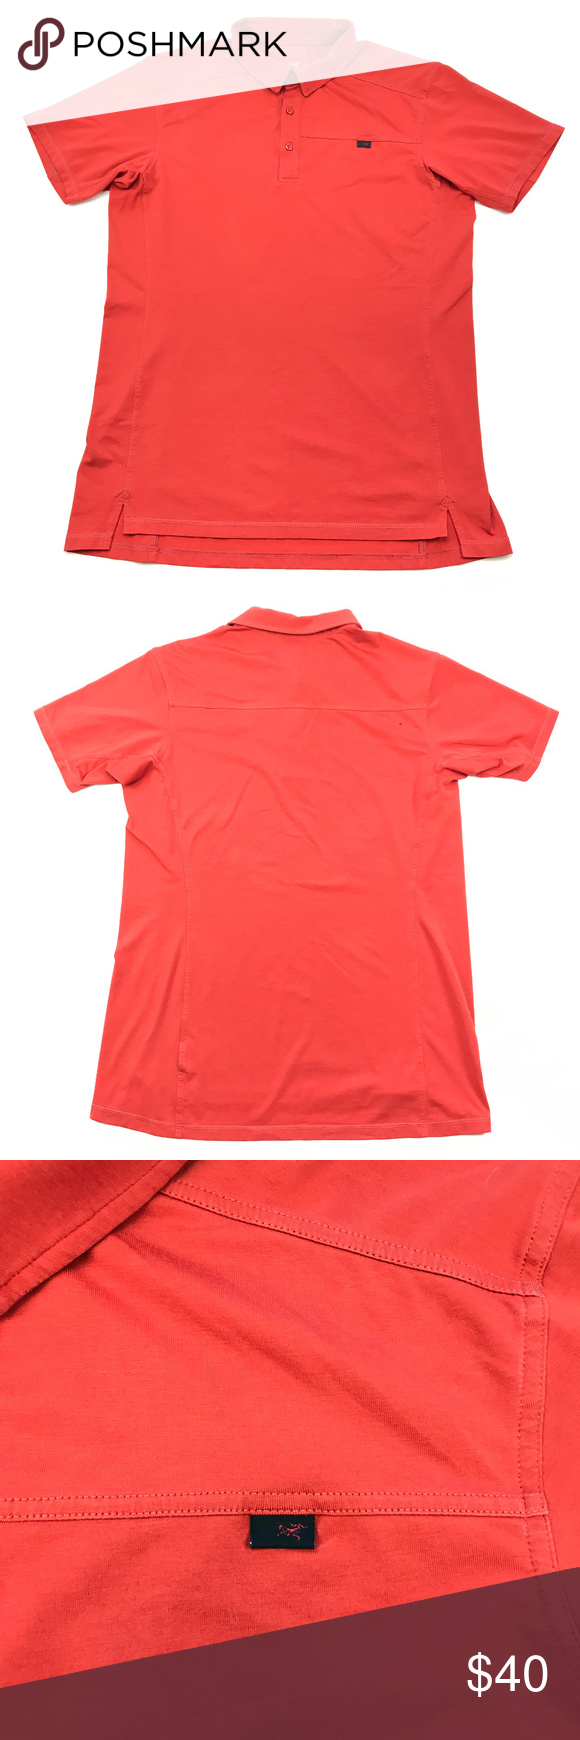 Arcteryx Captive Polo Short Sleeve Shirt My Posh Closet